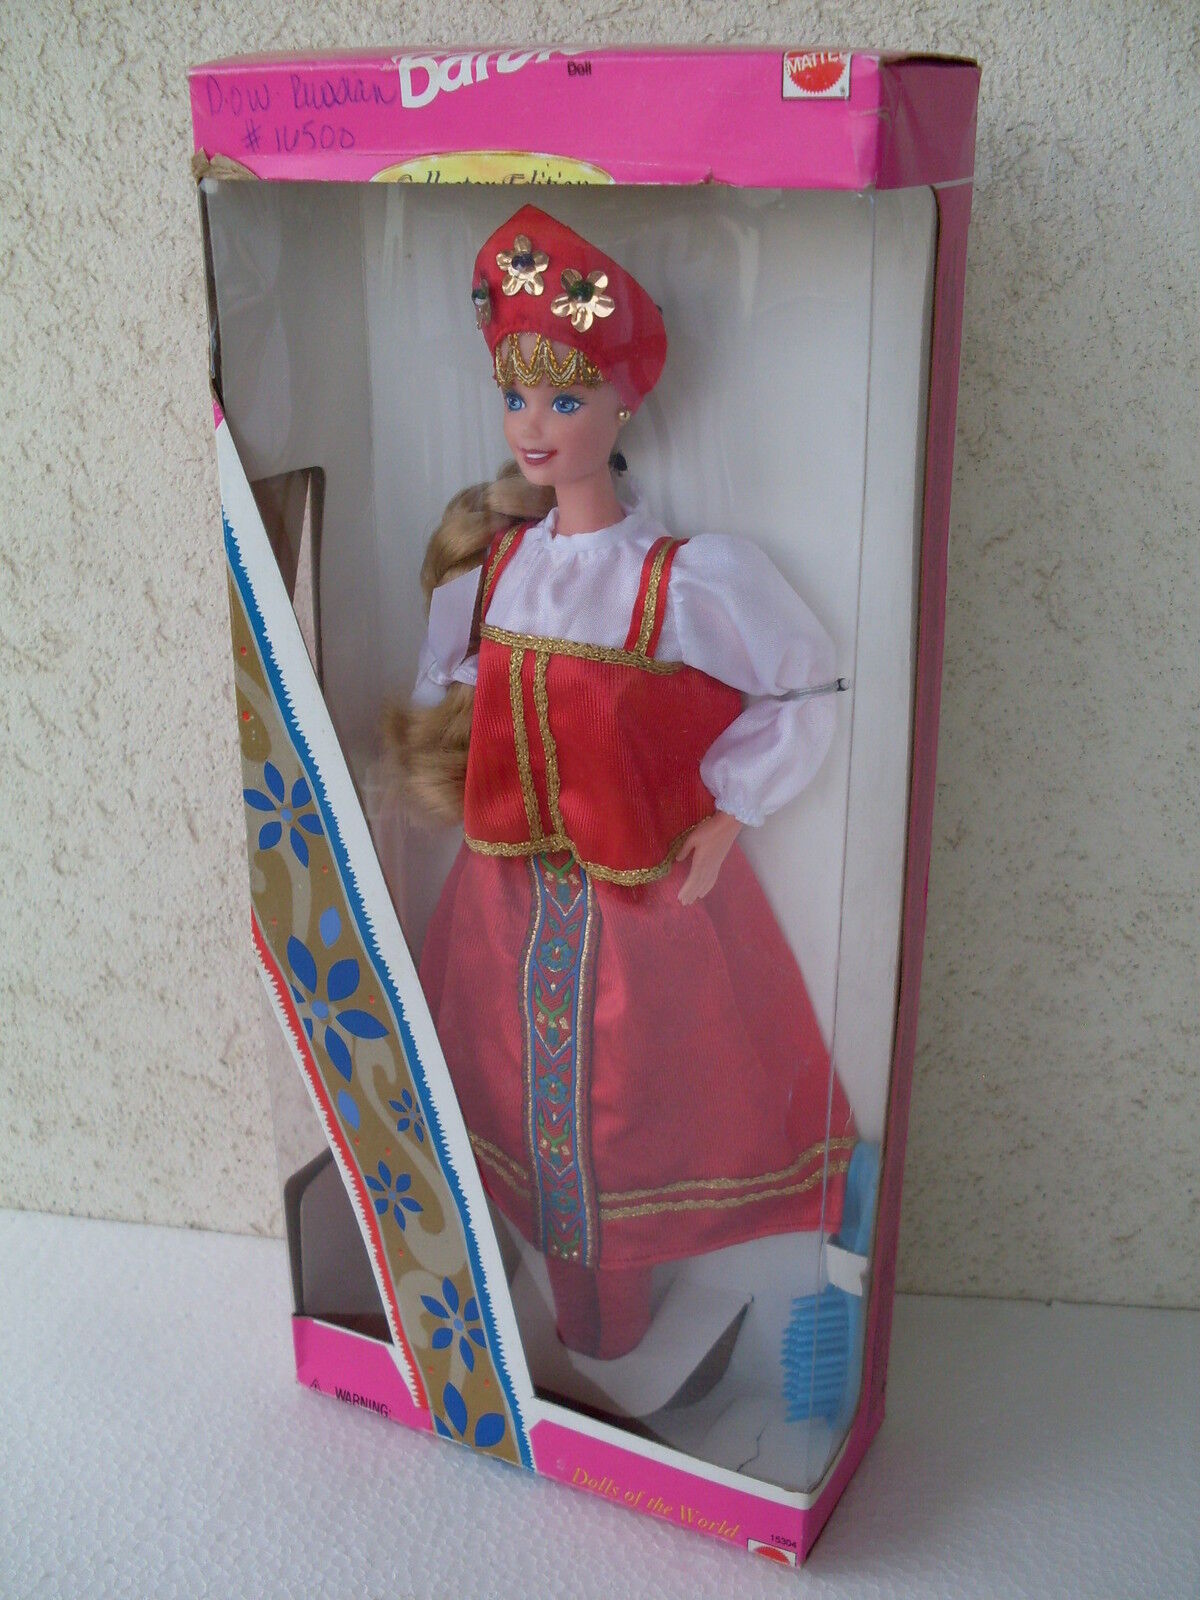 Barbie russian russia russa dolls dolls dolls of the world poupèe muneca dol 1996 dotw 16500 1972e8